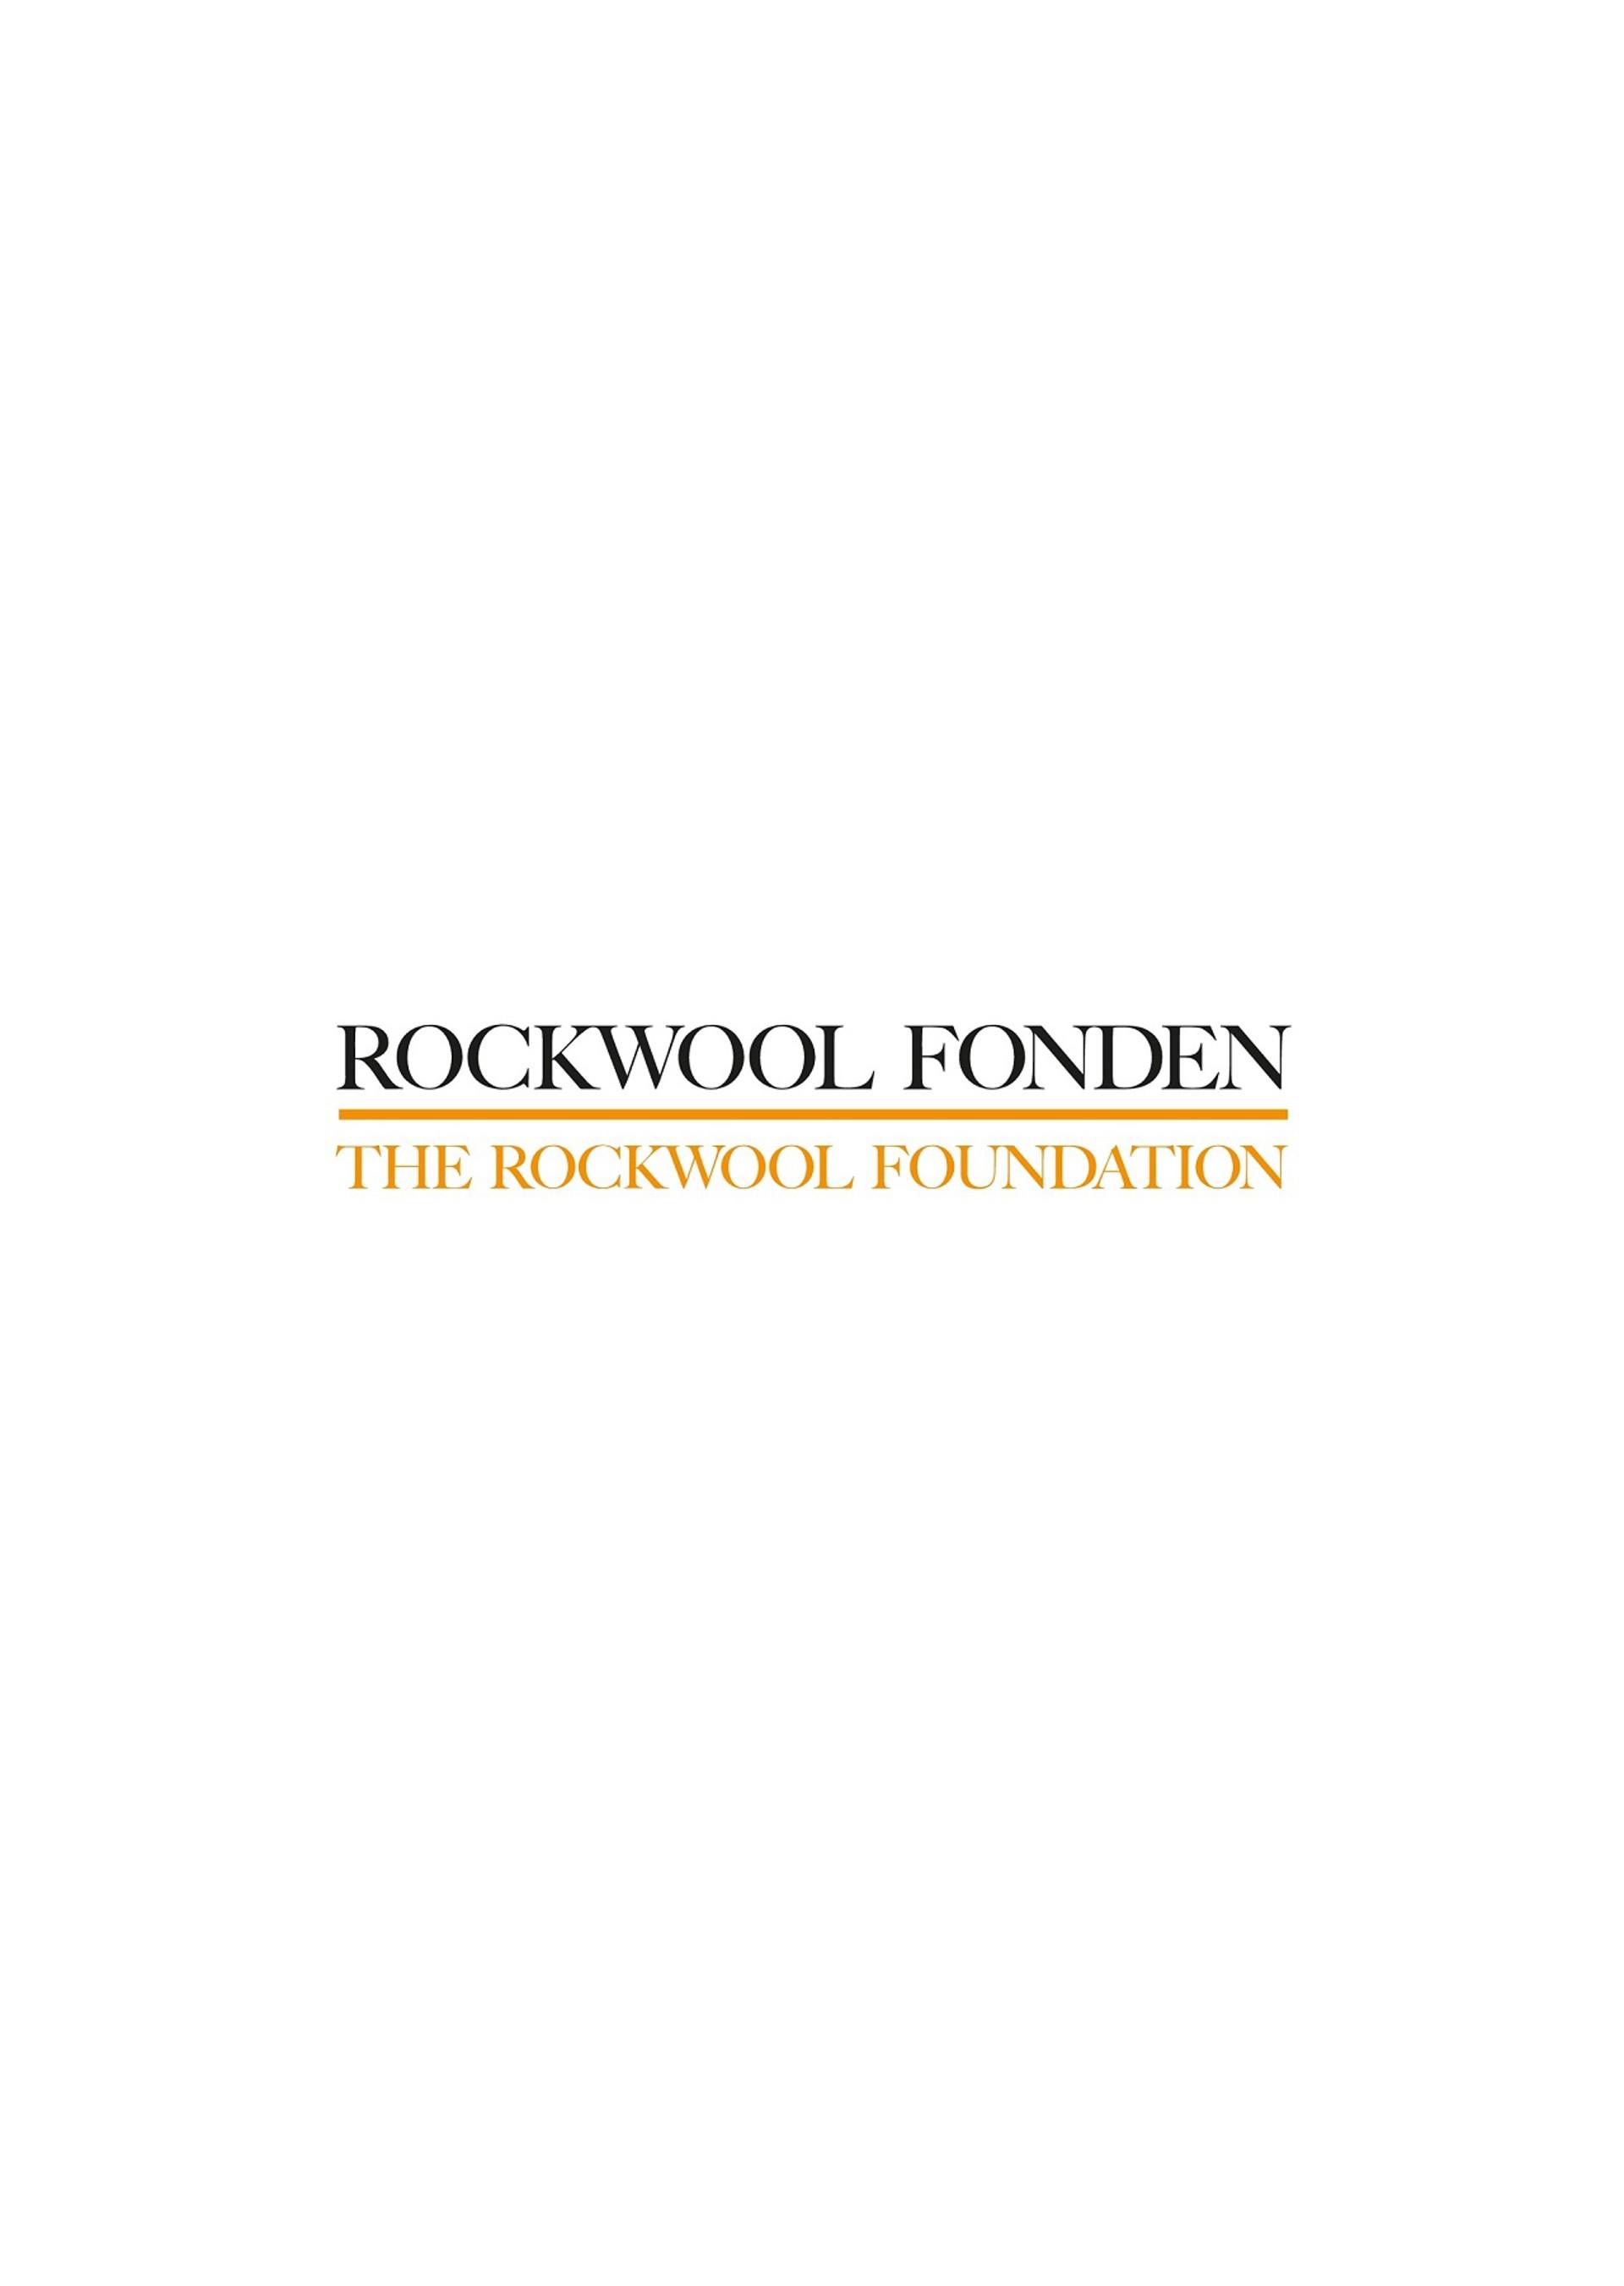 rockwool_fonden